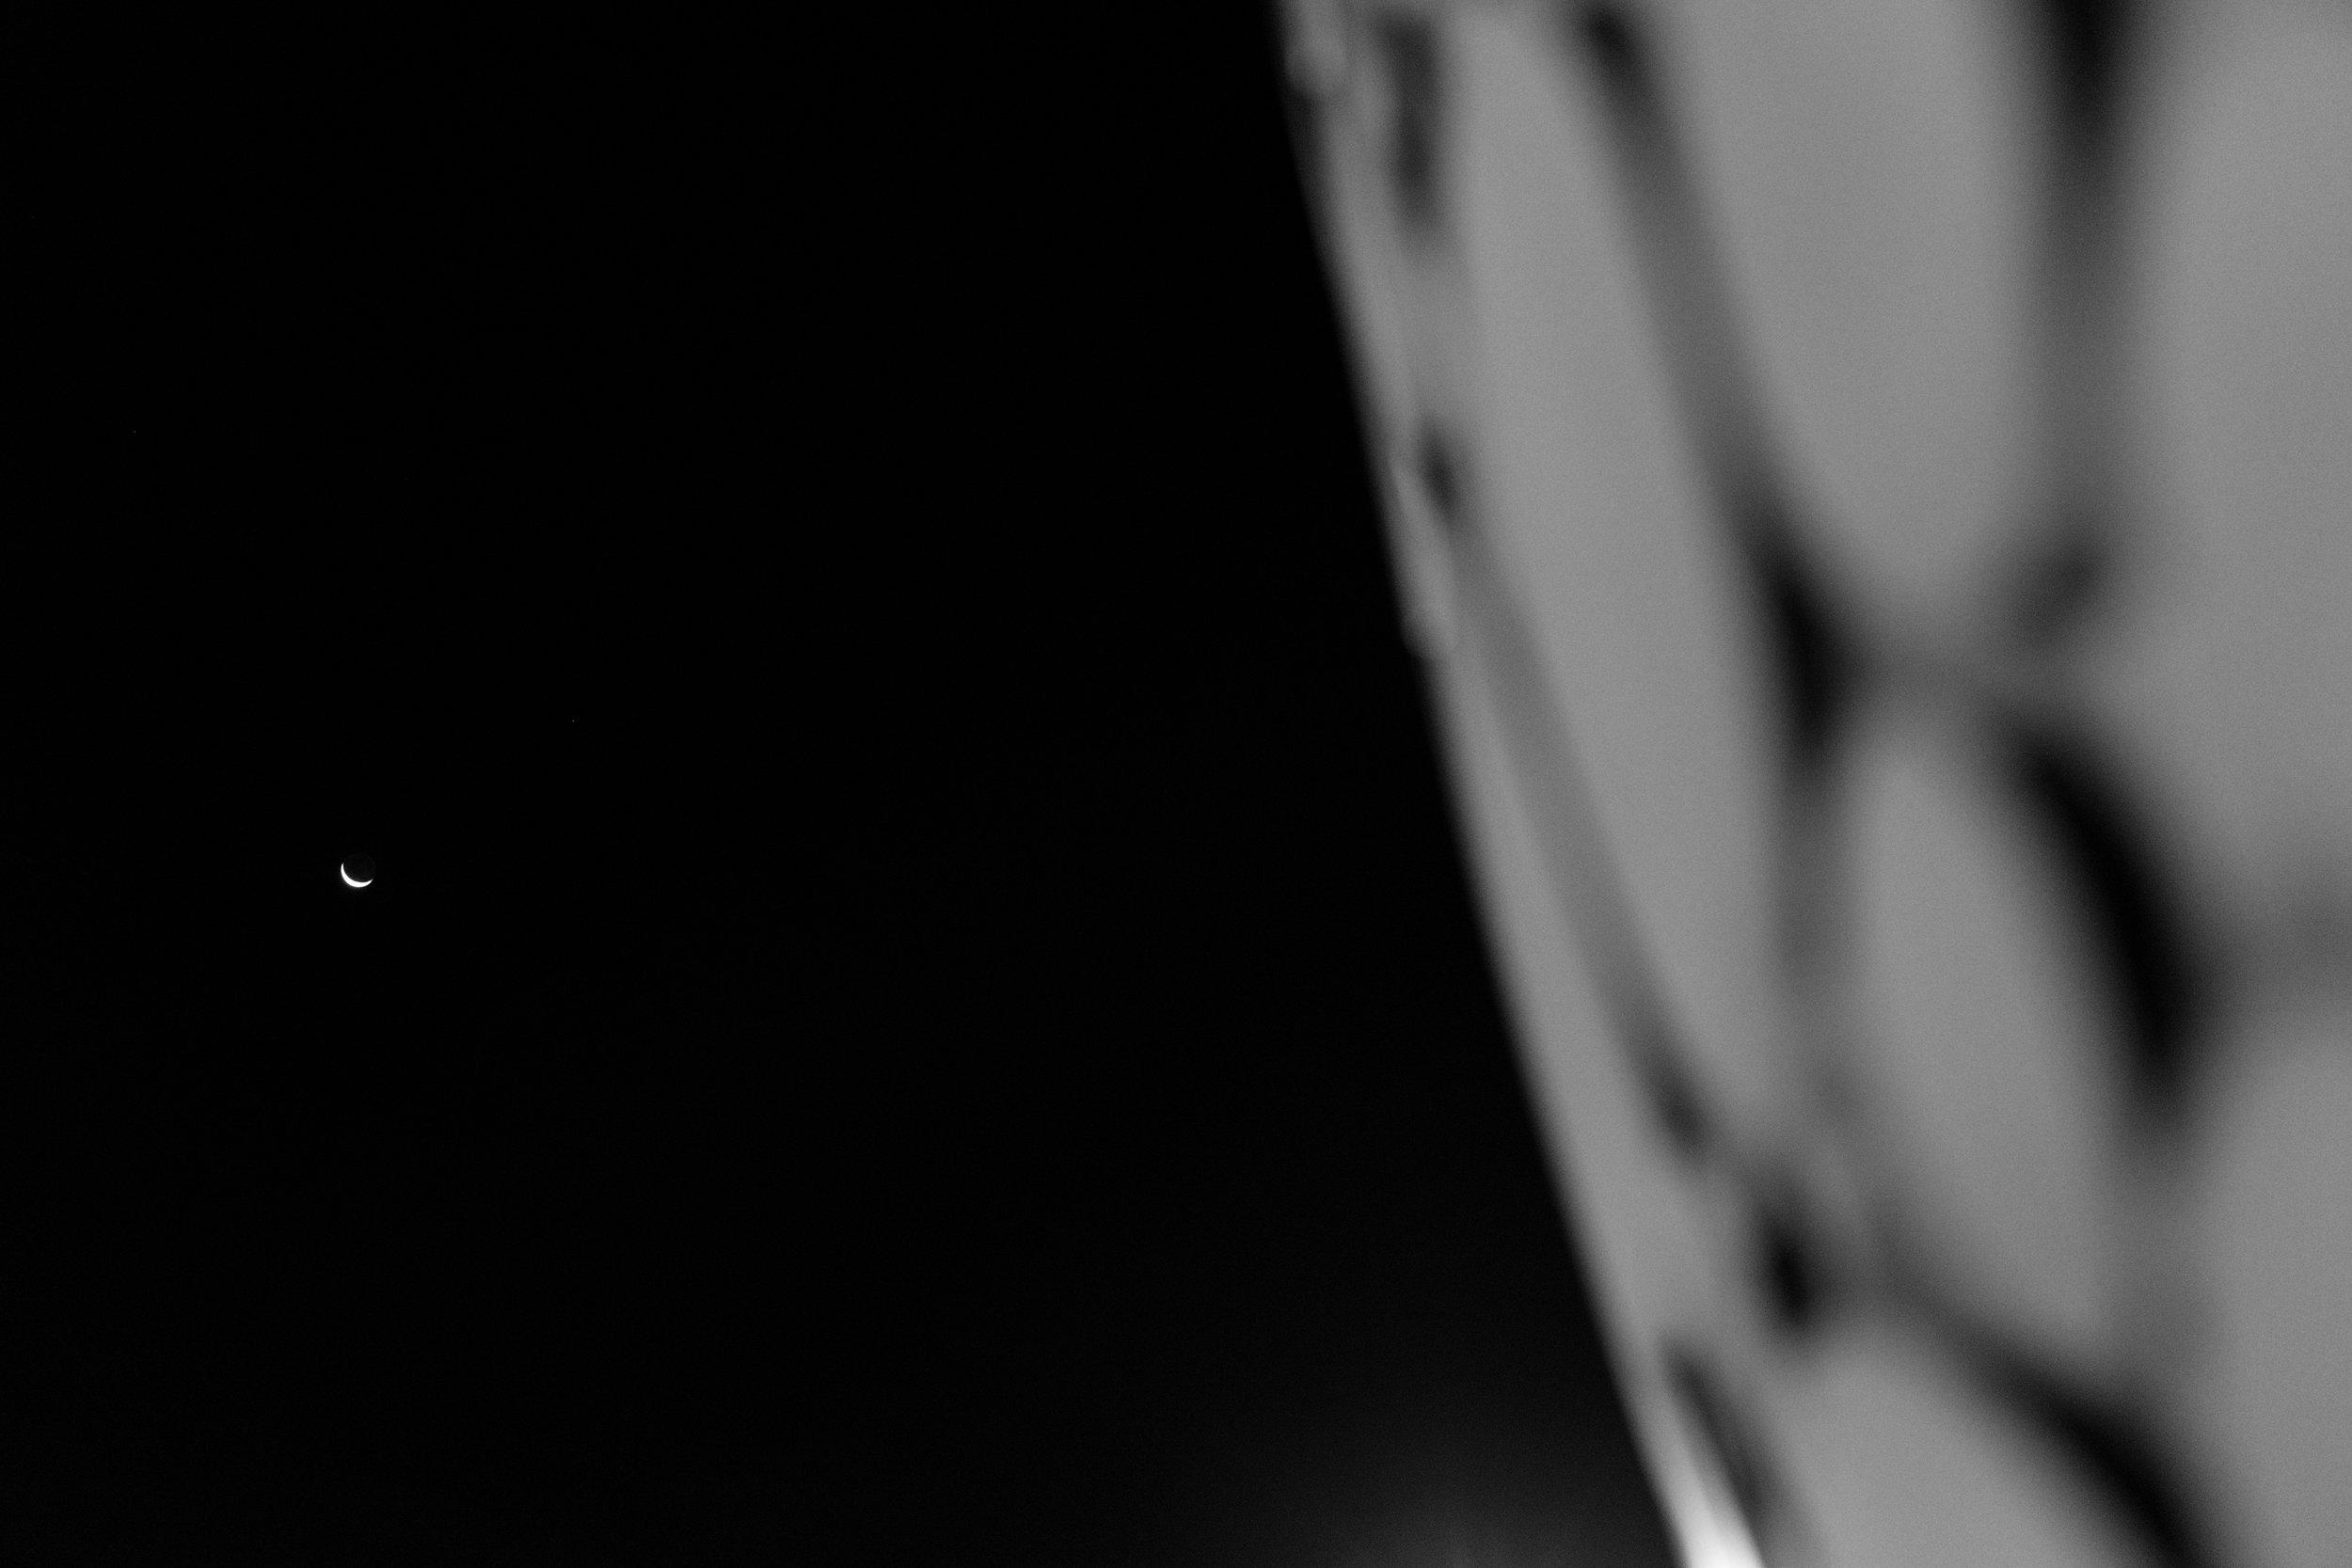 Moon Dot Wetzlar, Germany Leica SL 50mm f/2.0 APO Summicron © Keith R. Sbiral, 2018